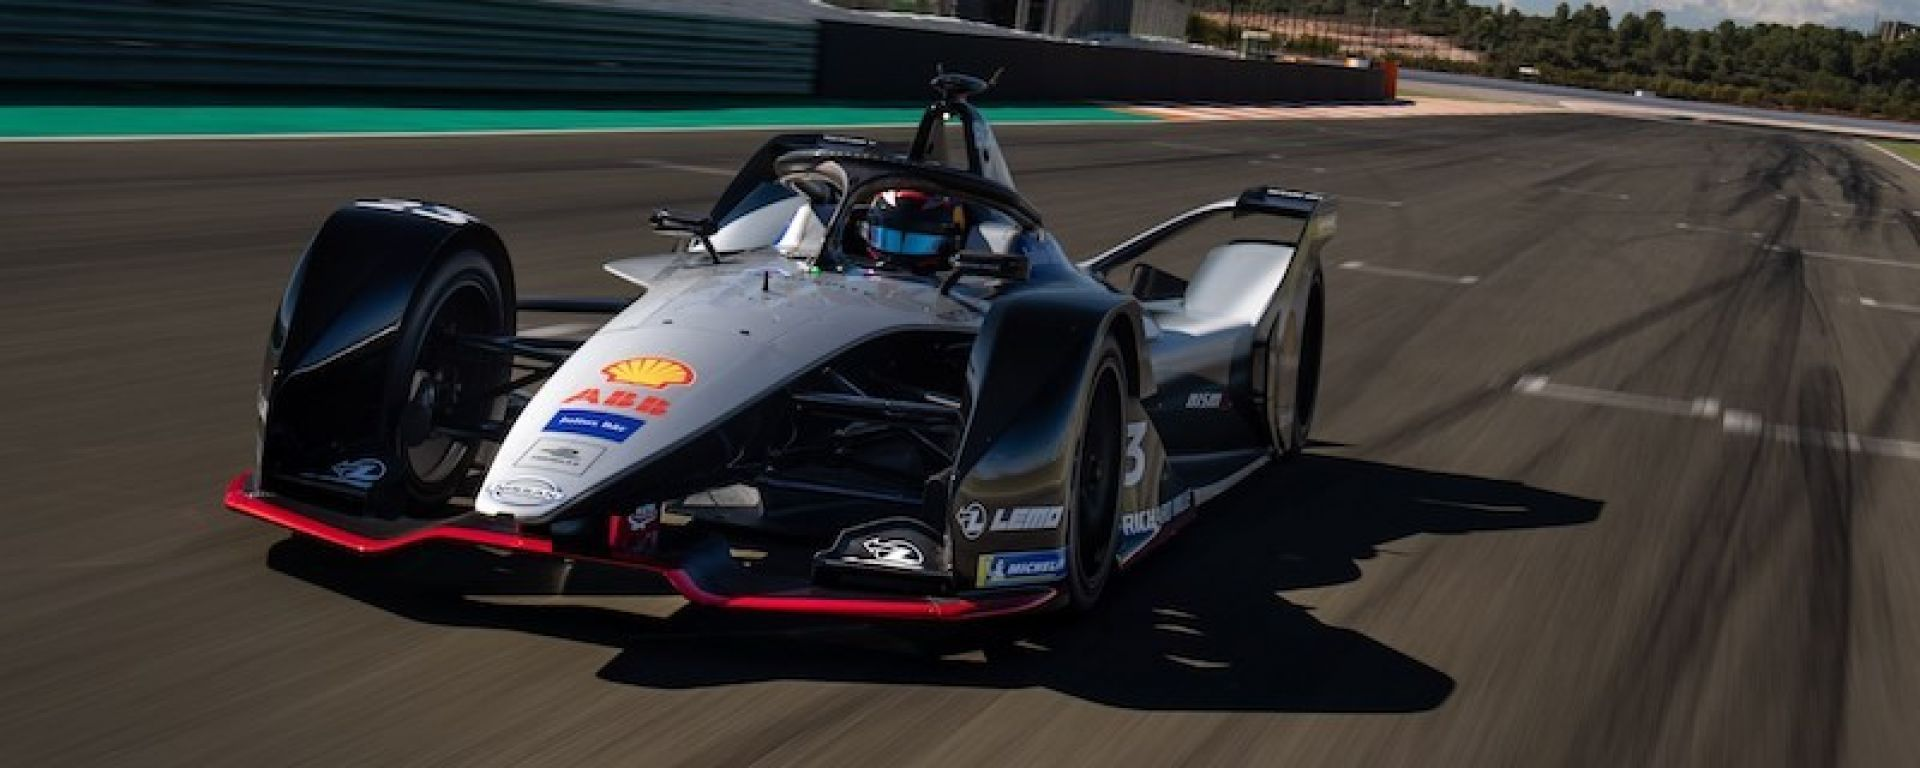 Formula E 2019: Nissan e.dams